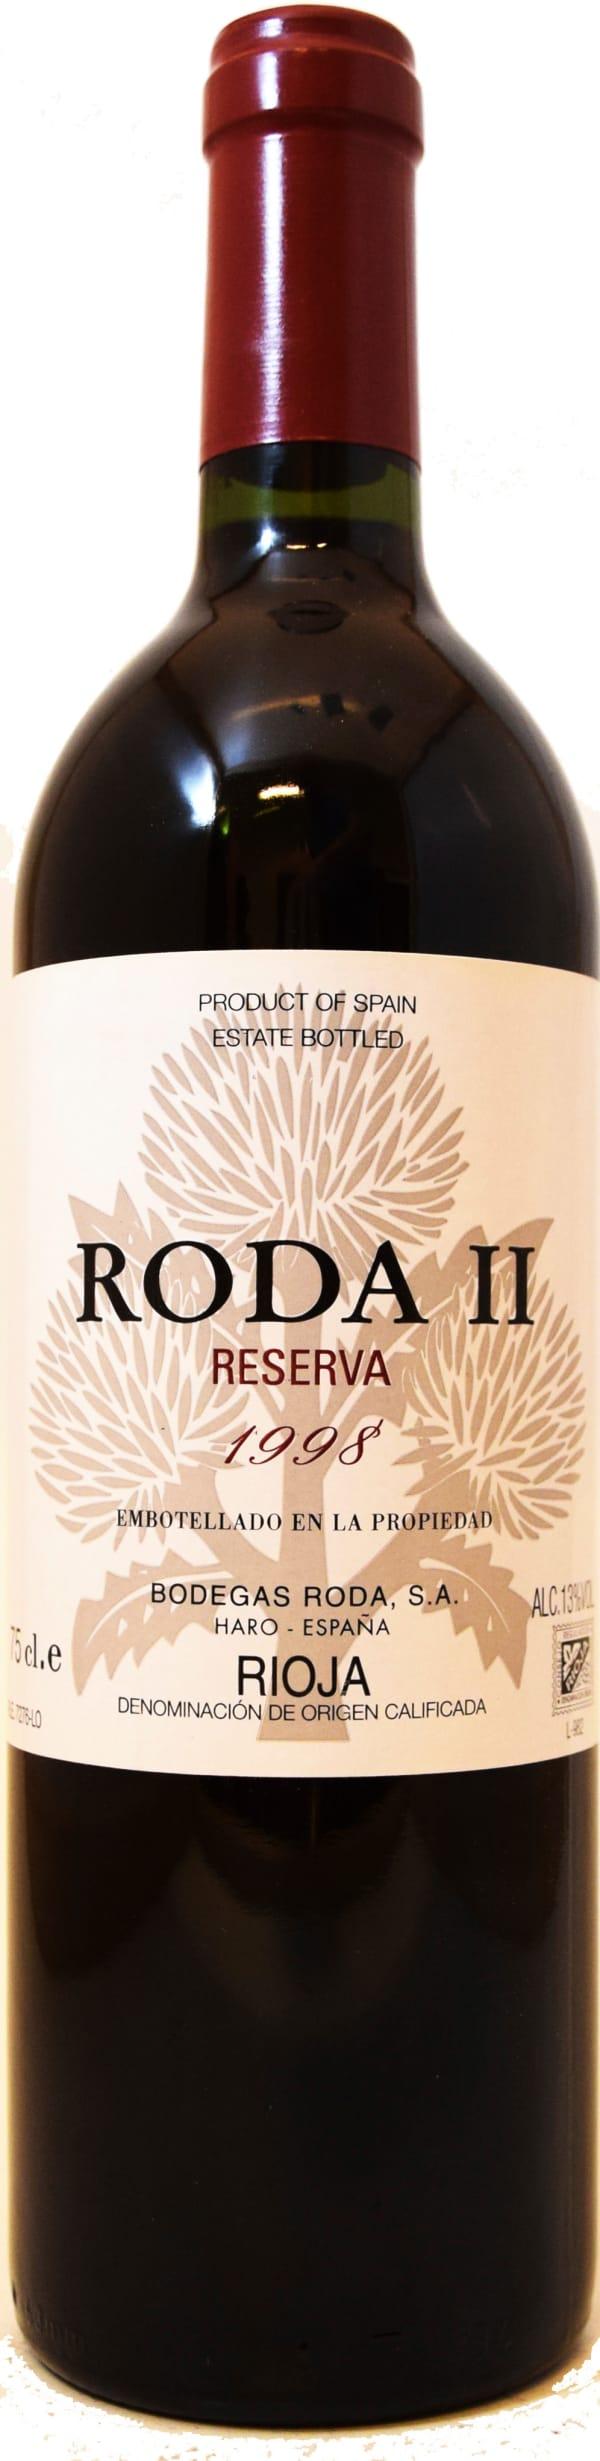 Roda II Reserva 1998